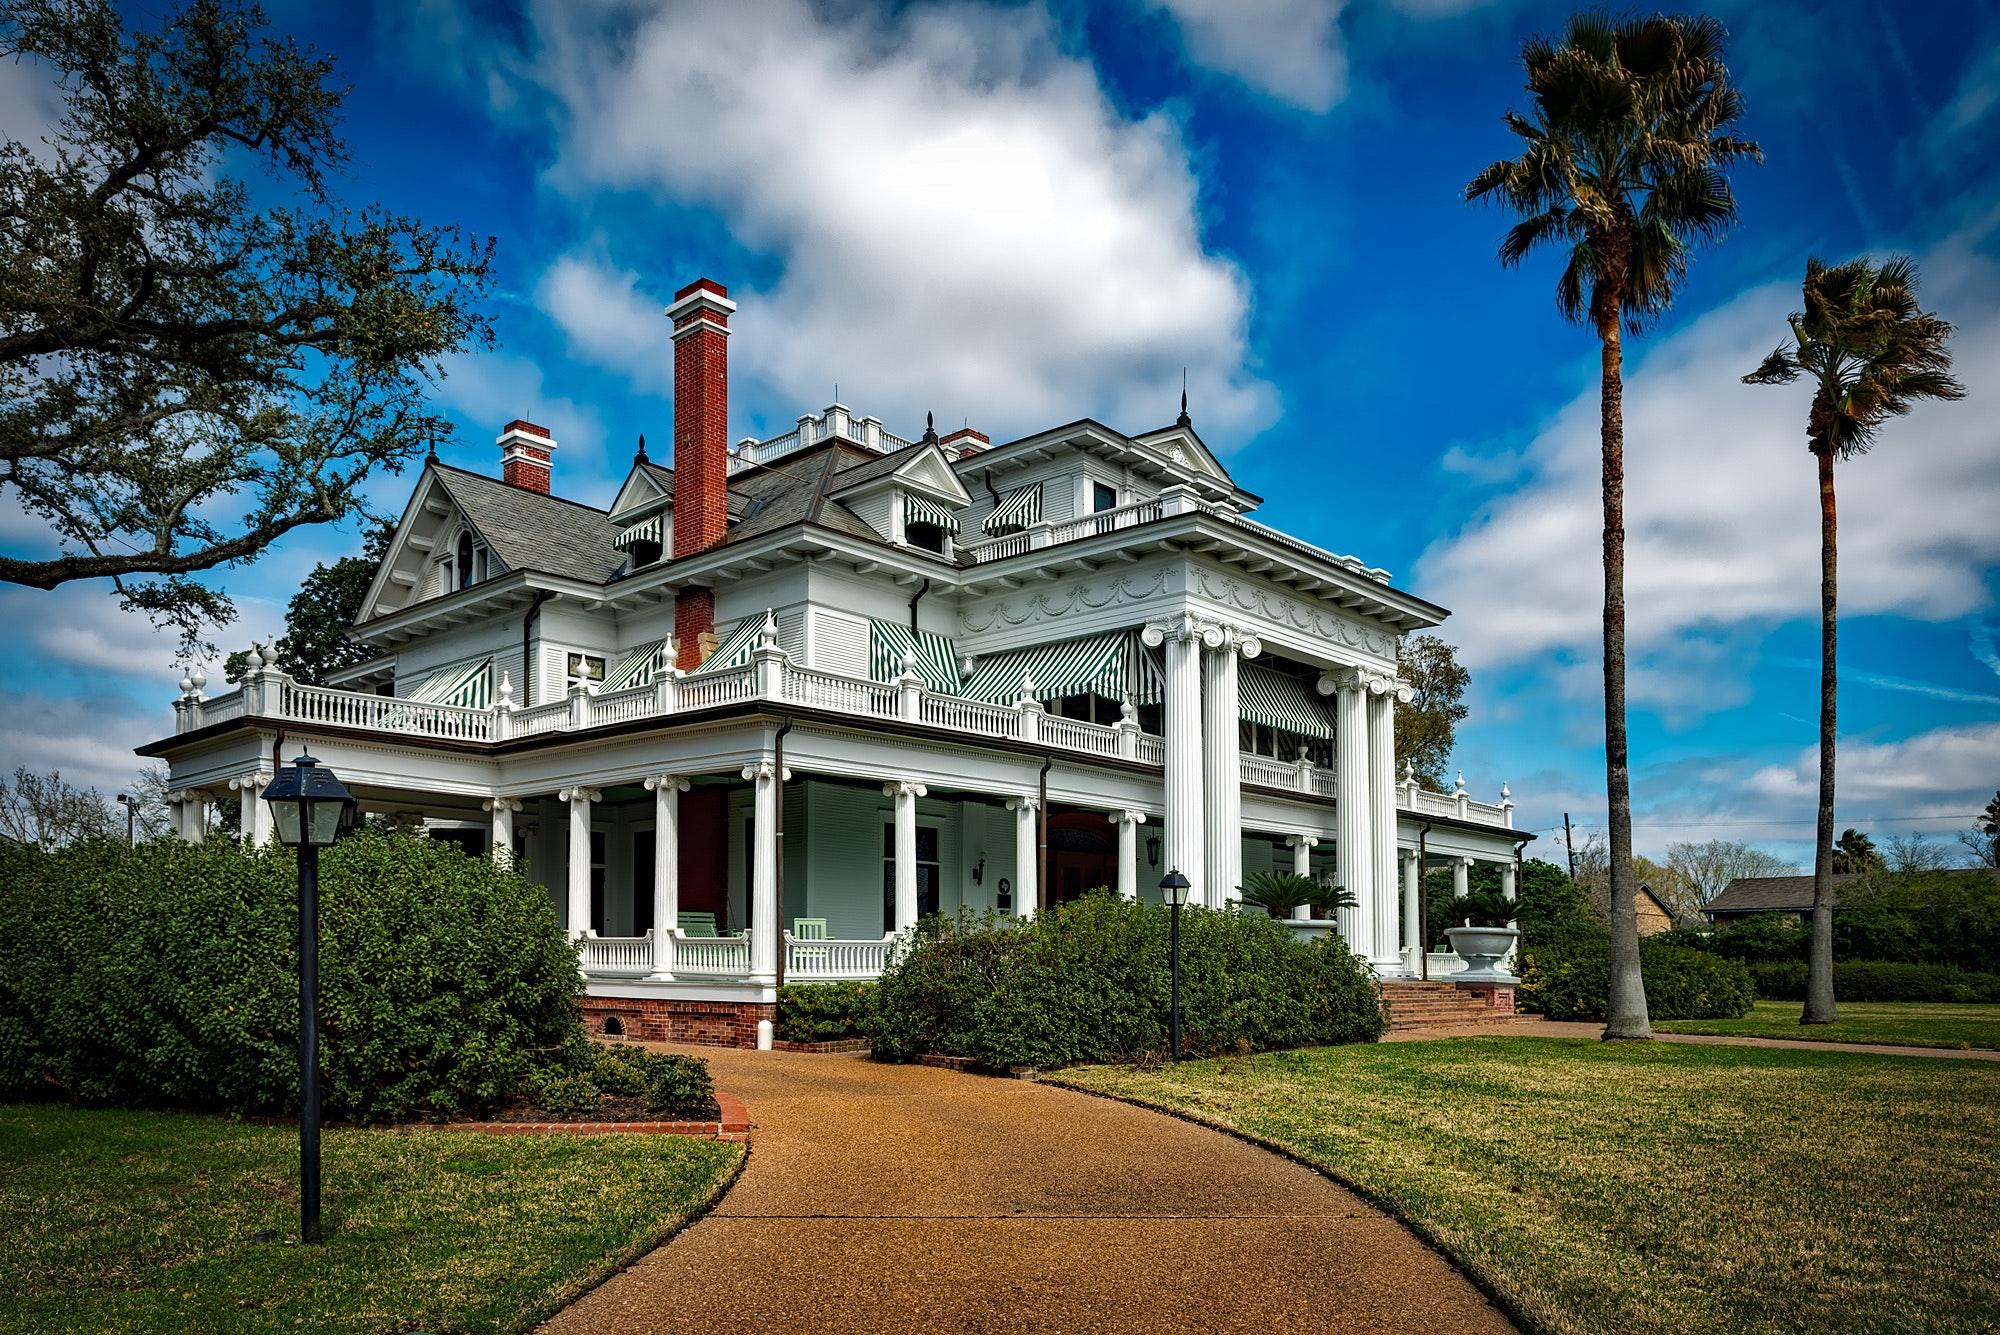 architecture-bushes-chimneys-208736